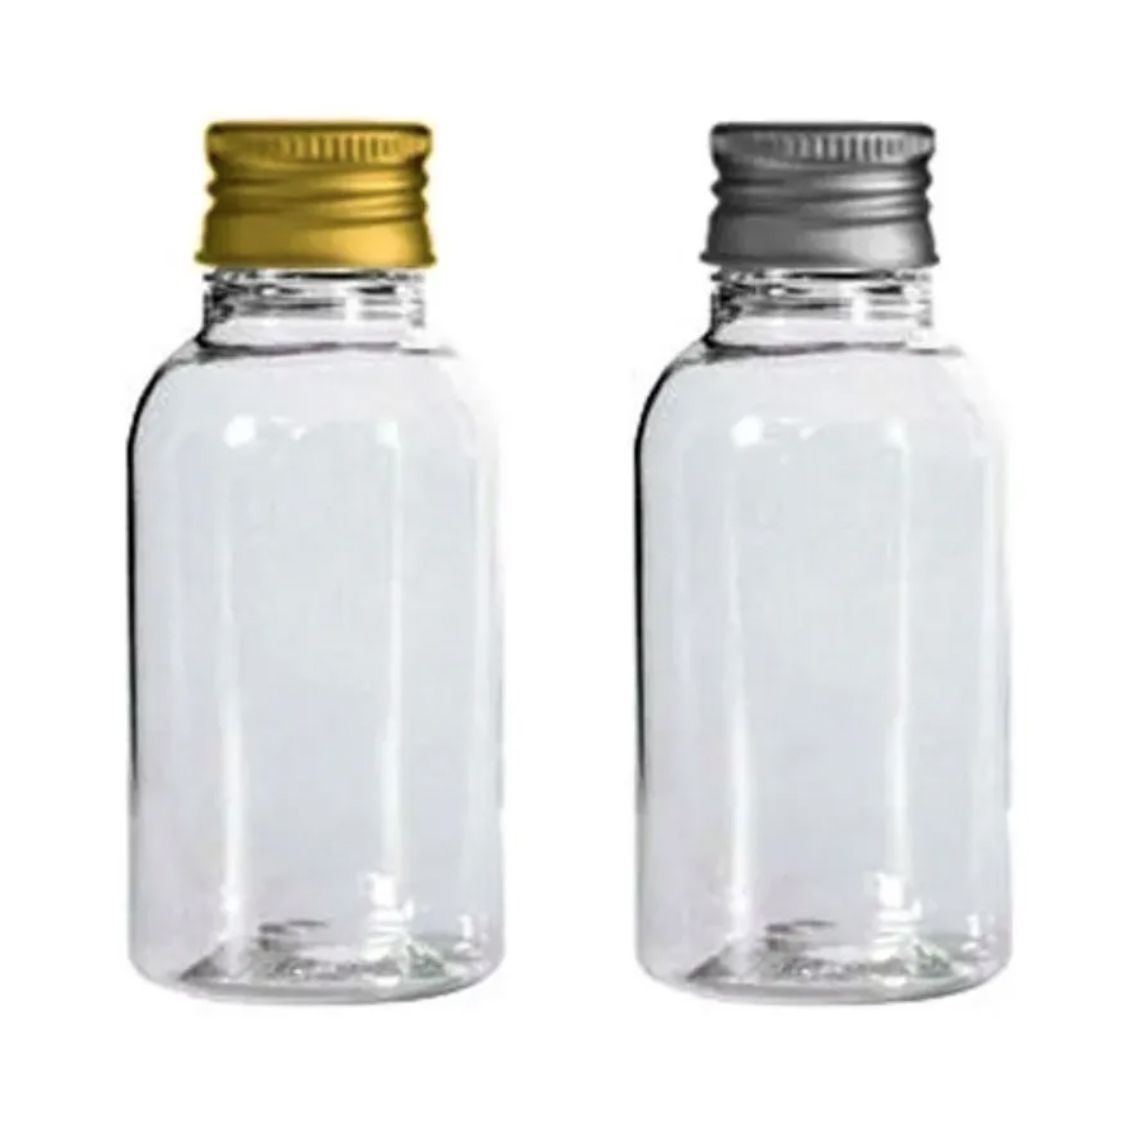 Frasco pet plastico para Lembrancinhas 30 ml Cilindrico kit 10 unid